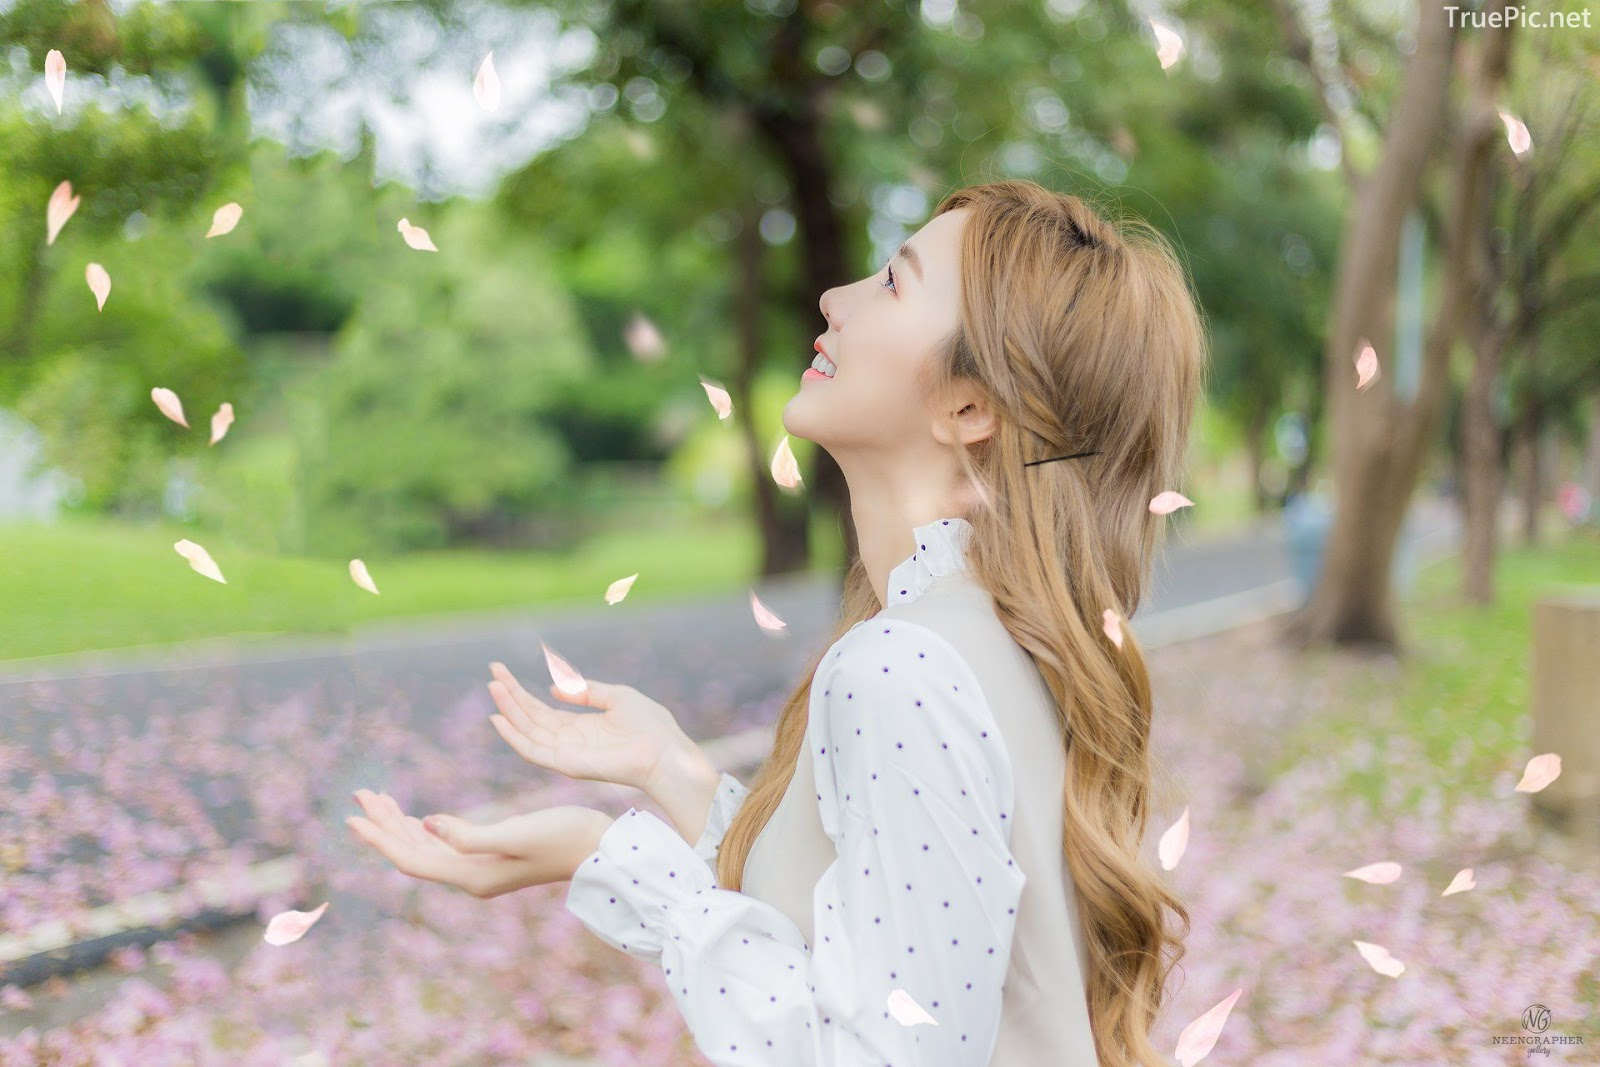 Thailand cute model Nilawan Iamchuasawad - Beautiful girl in the flower field - Photo by จิตรทิวัส จั่นระยับ - Picture 9